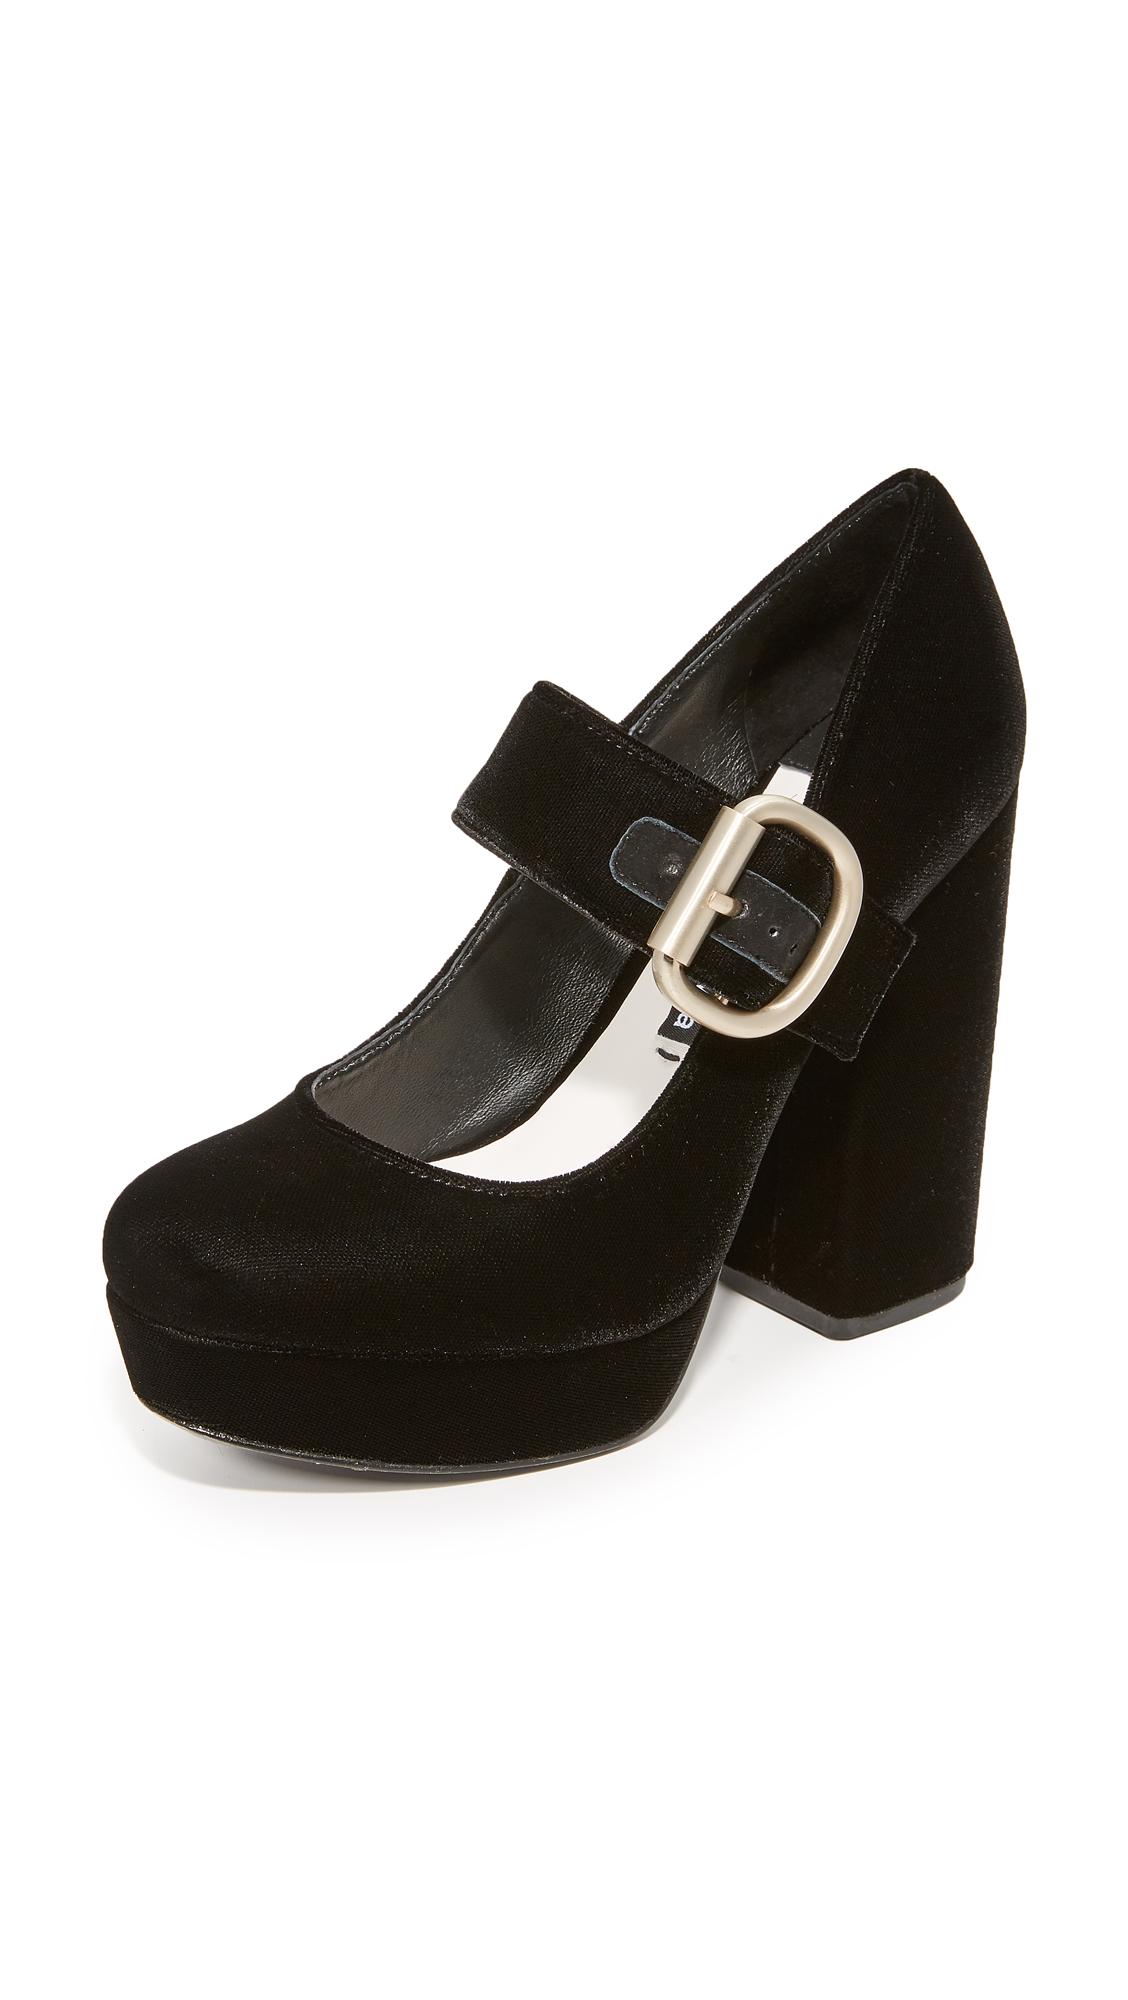 alice + olivia Houston Platform Mary Jane Pumps - Black